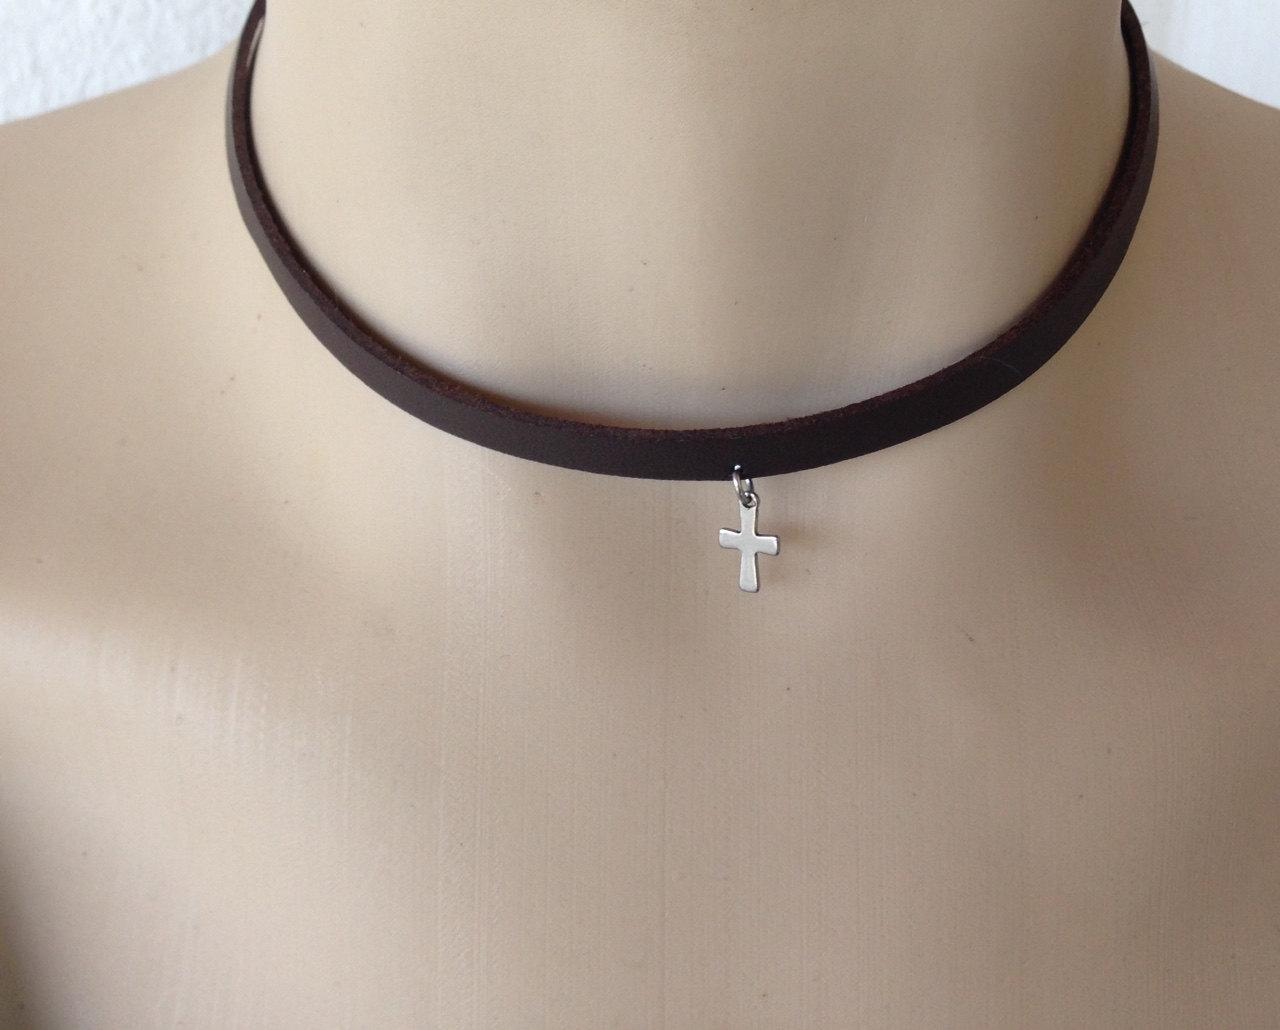 cross choker necklace in stainless steel